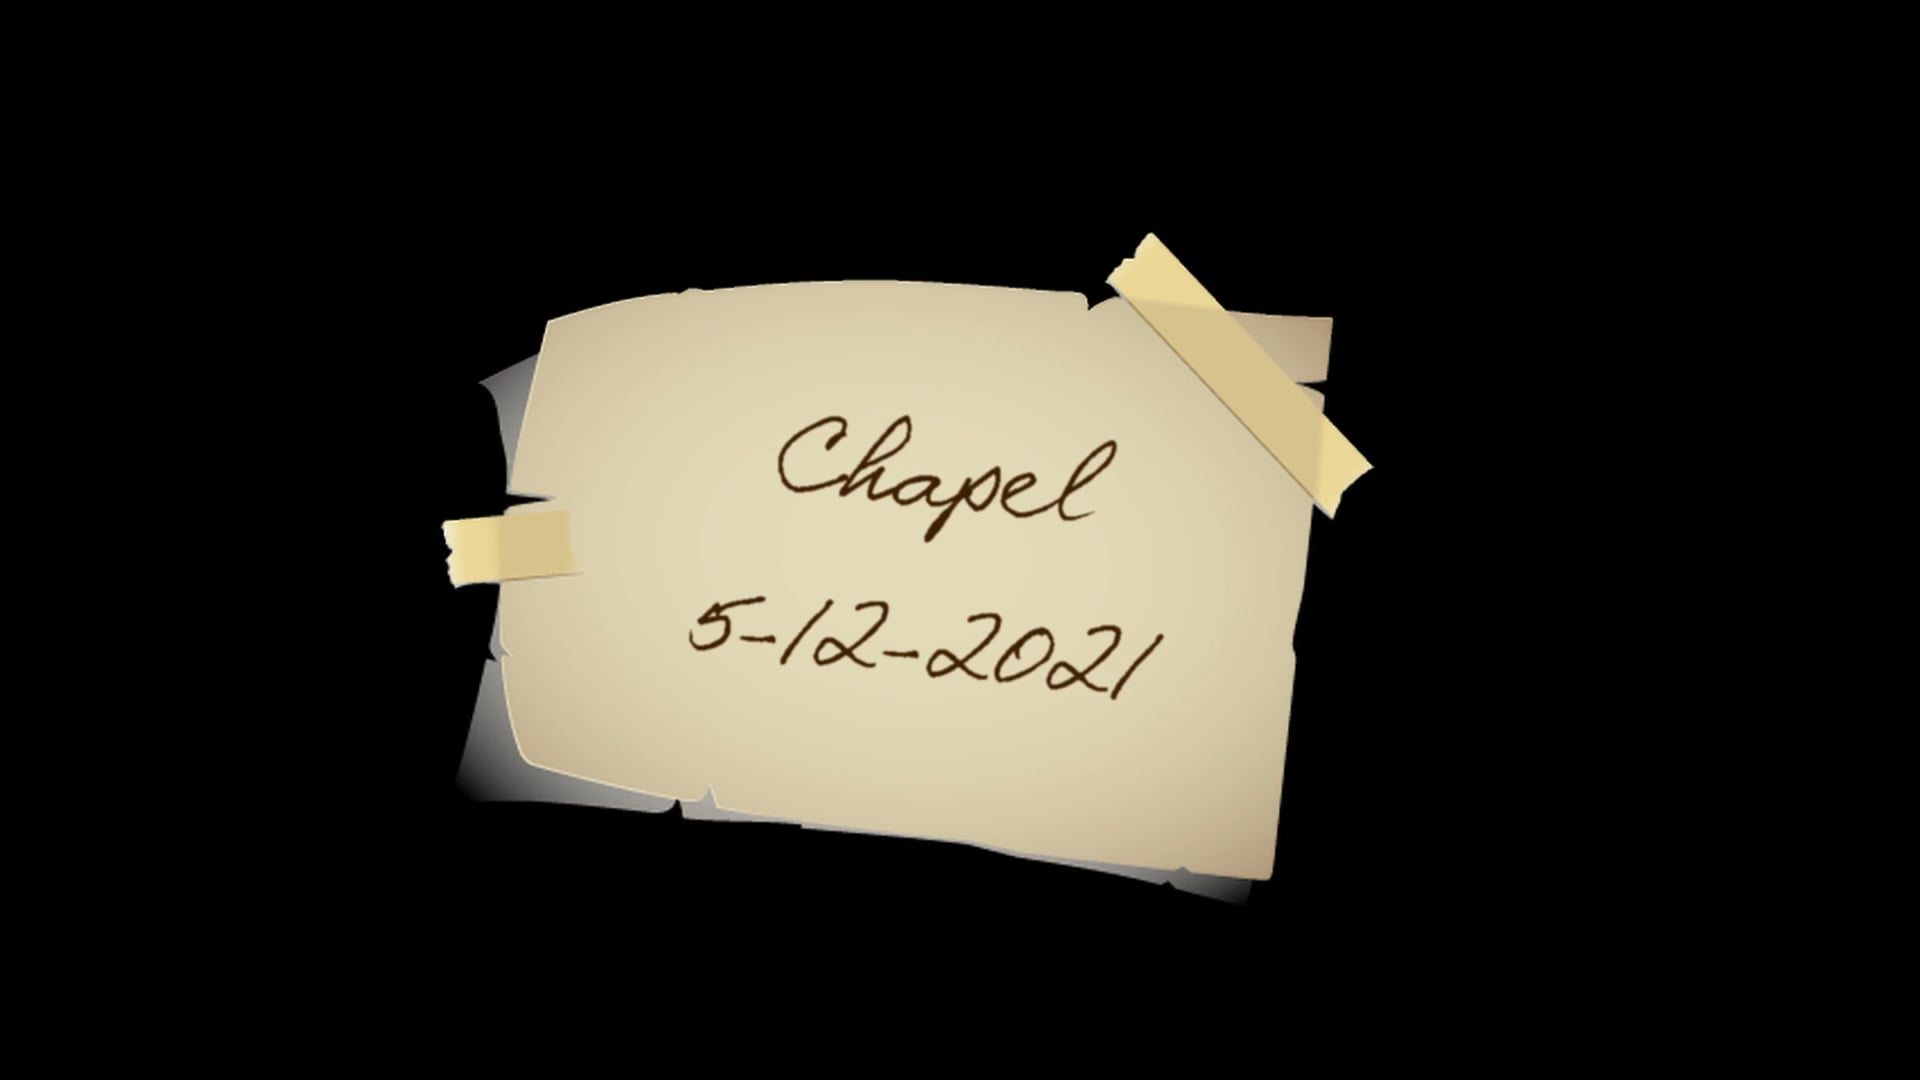 2021_05_12 Chapel Cahill